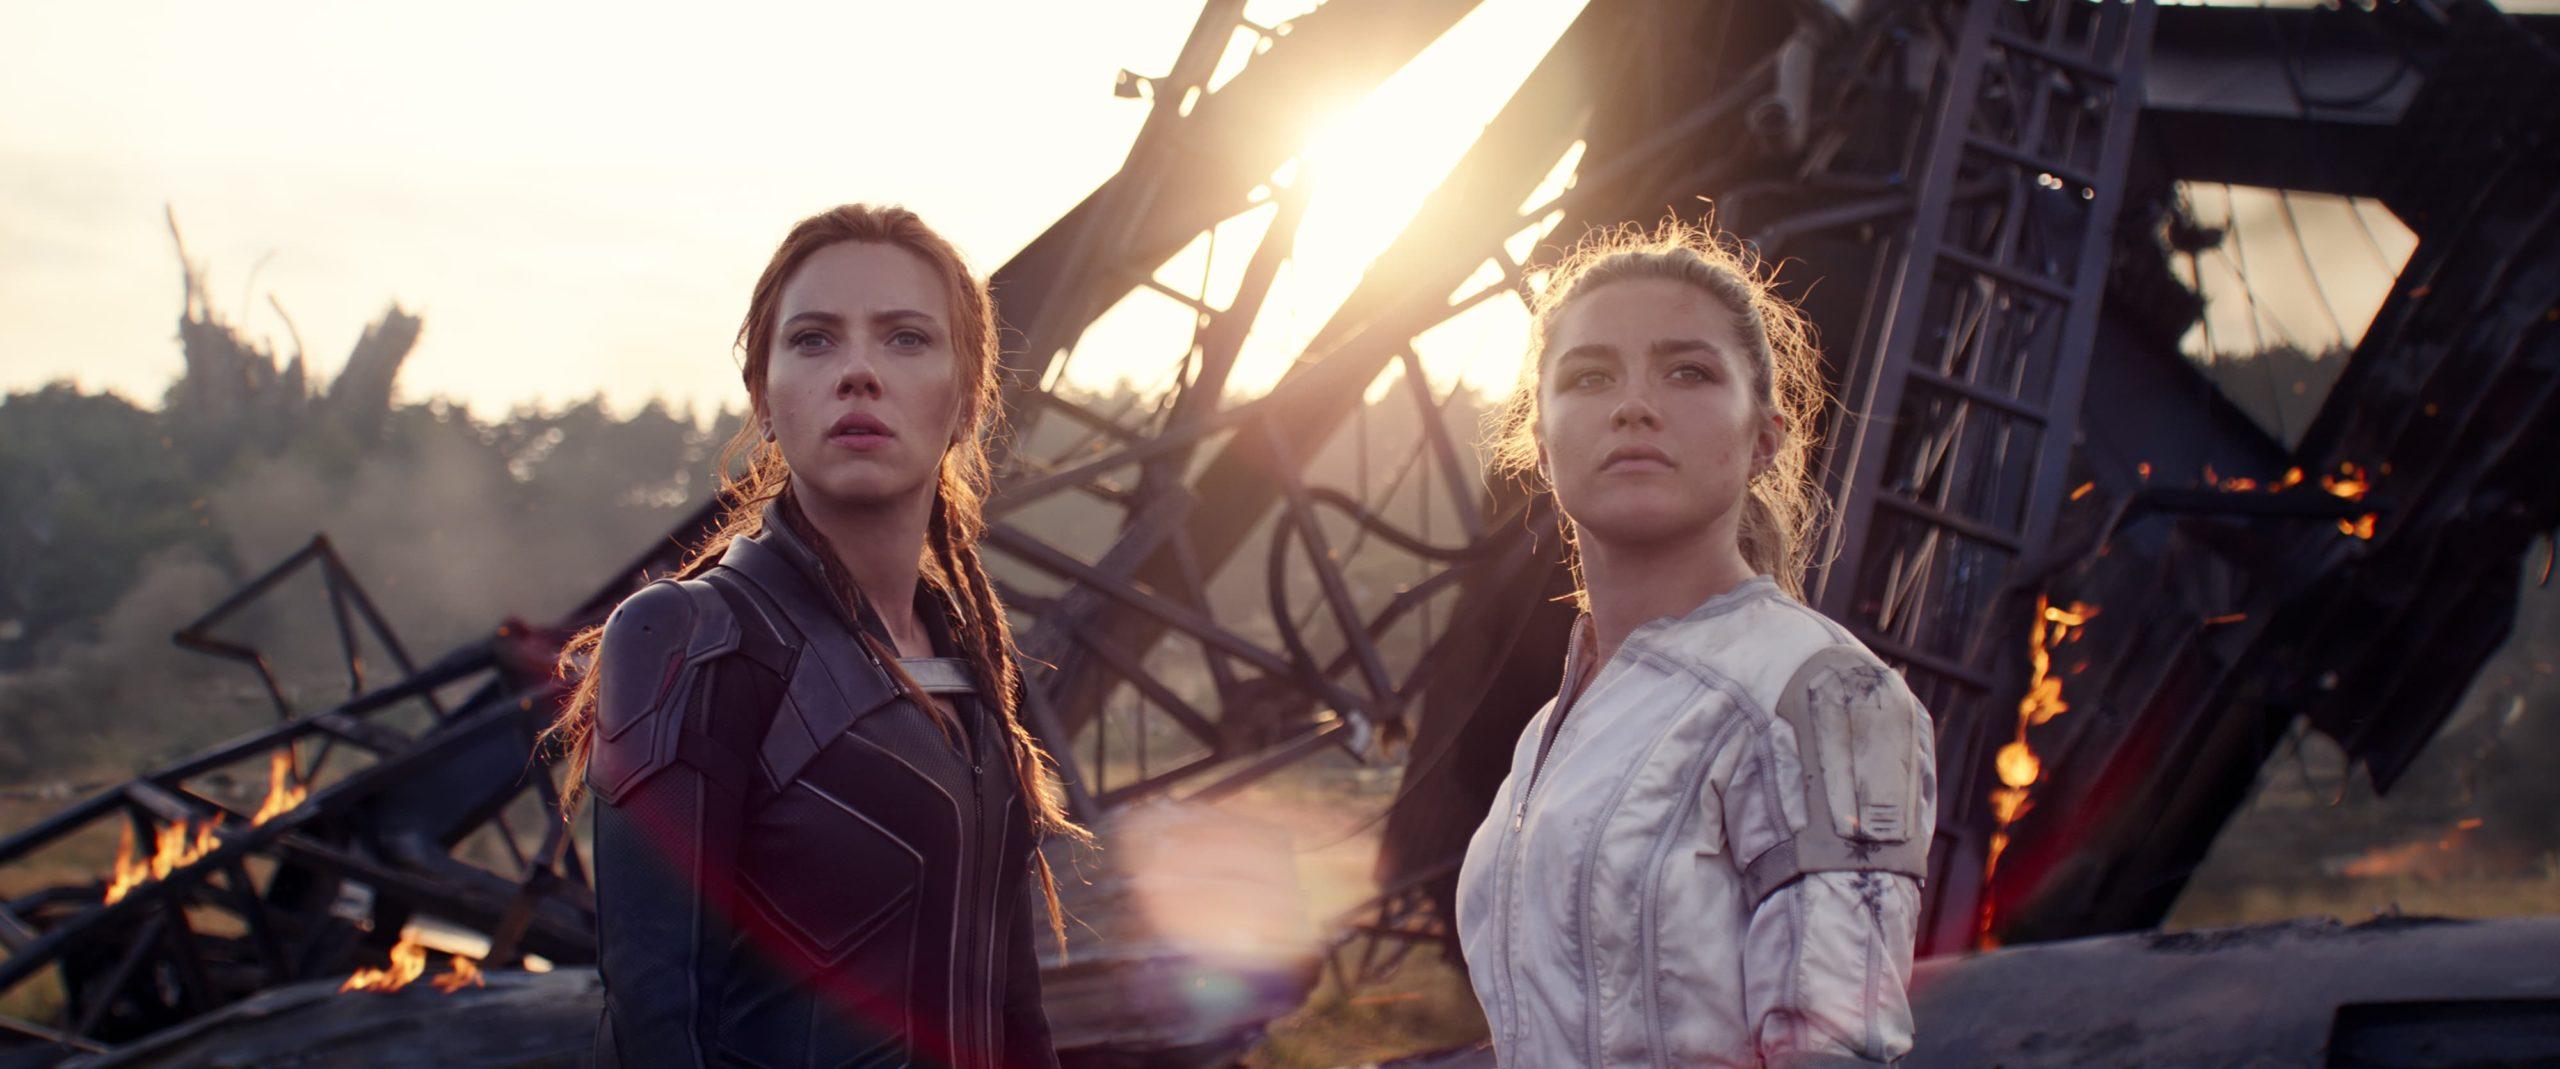 Black Widow Movie Review: Worth The Wait?